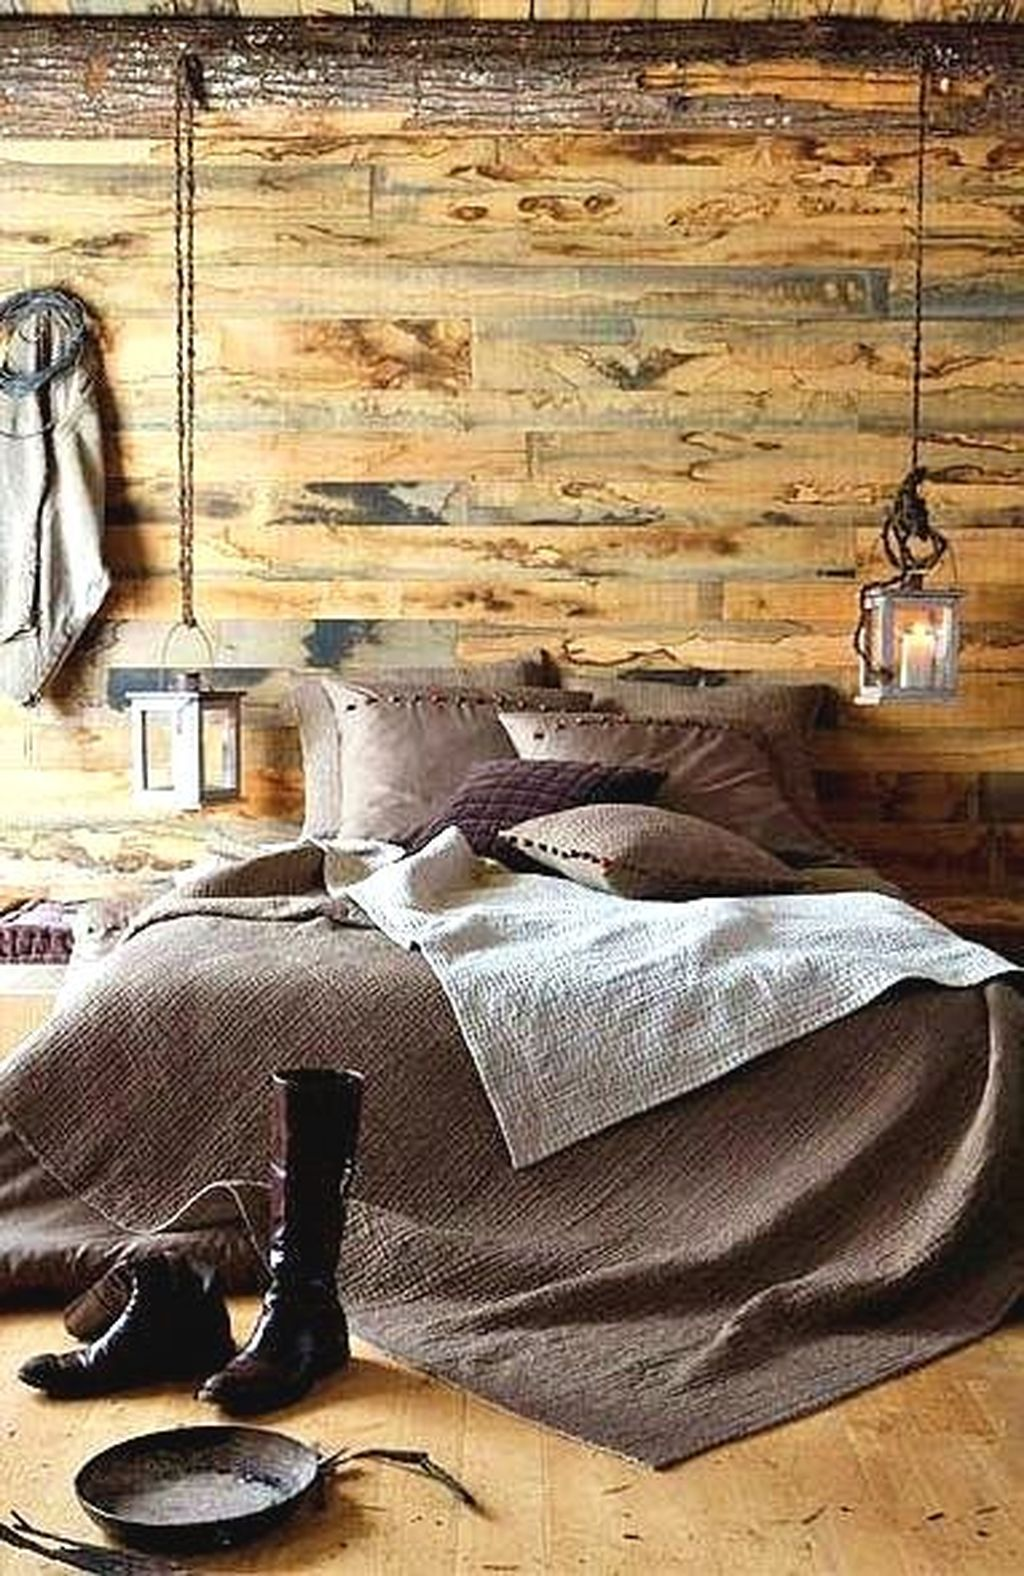 Rustic Romantic Bedroom Ideas: 36 Beautiful Romantic Industrial Bedroom Ideas